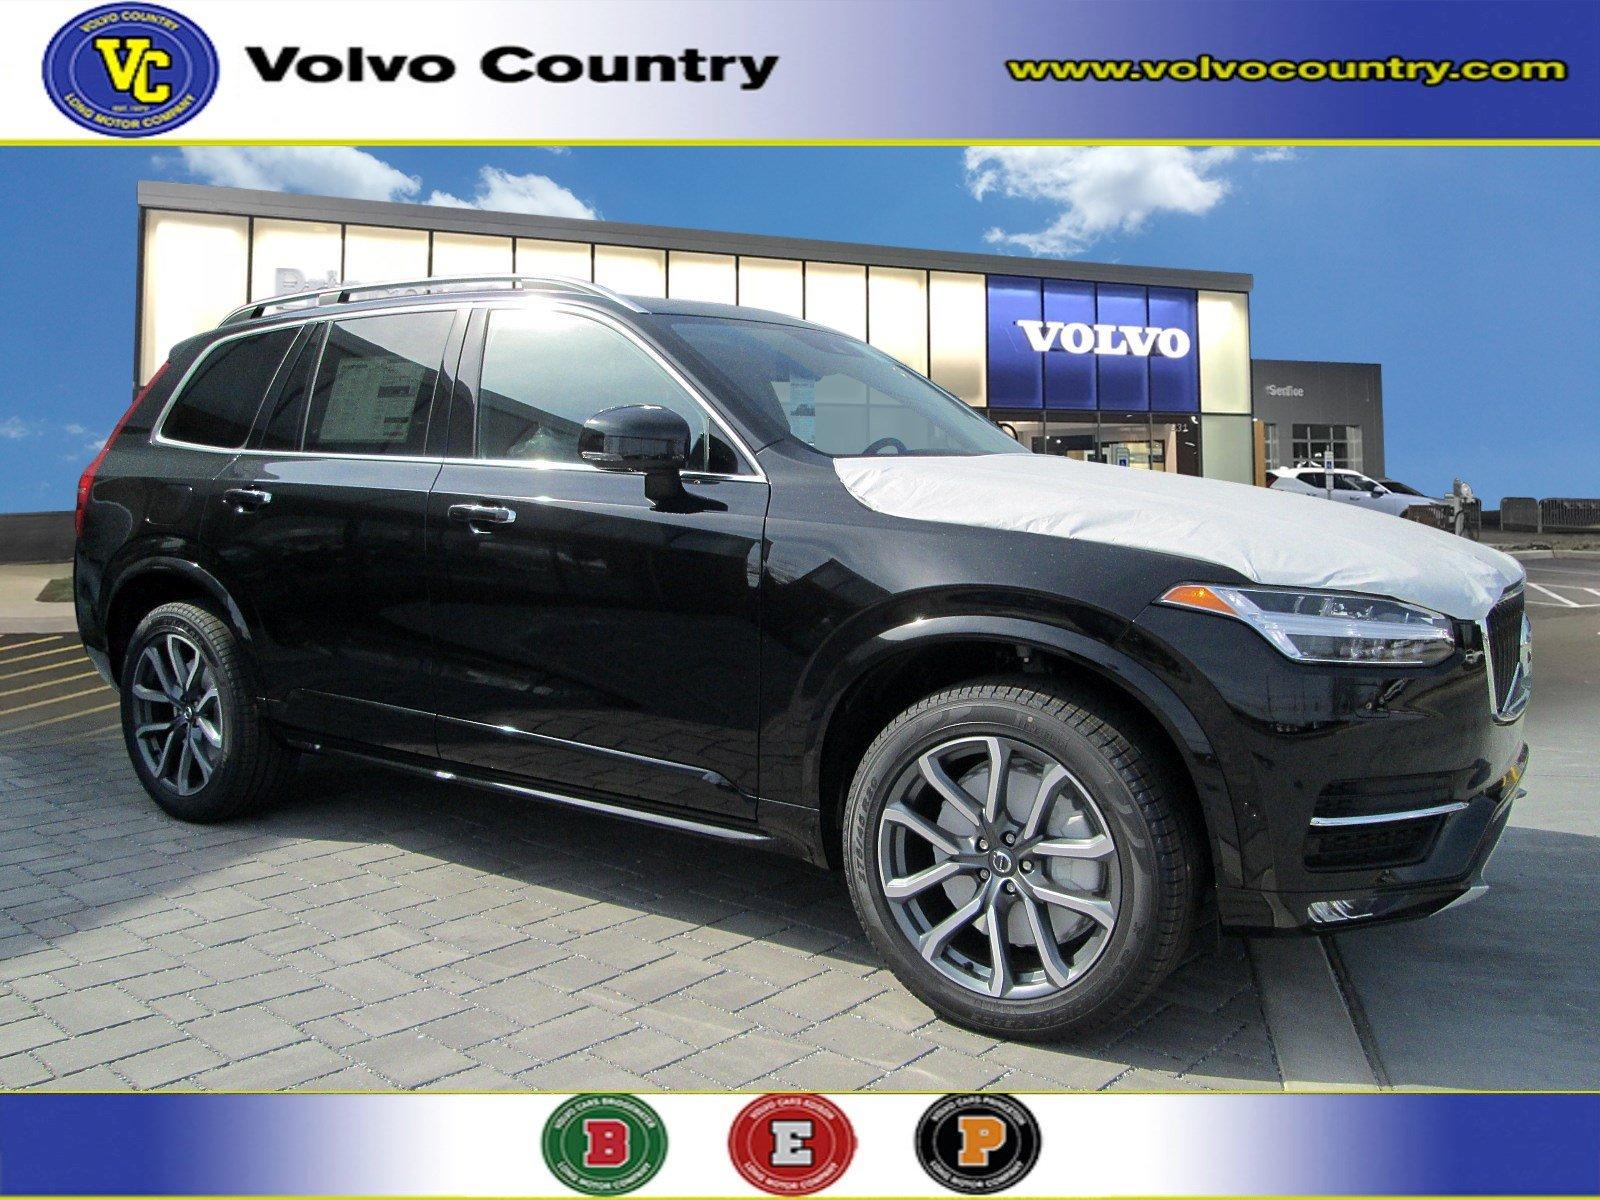 New For Sale Near Princeton Nj Yv4a22pk9k1494533 Serving Lawrenceville Hamilton Cherry Hill And Philadelphia